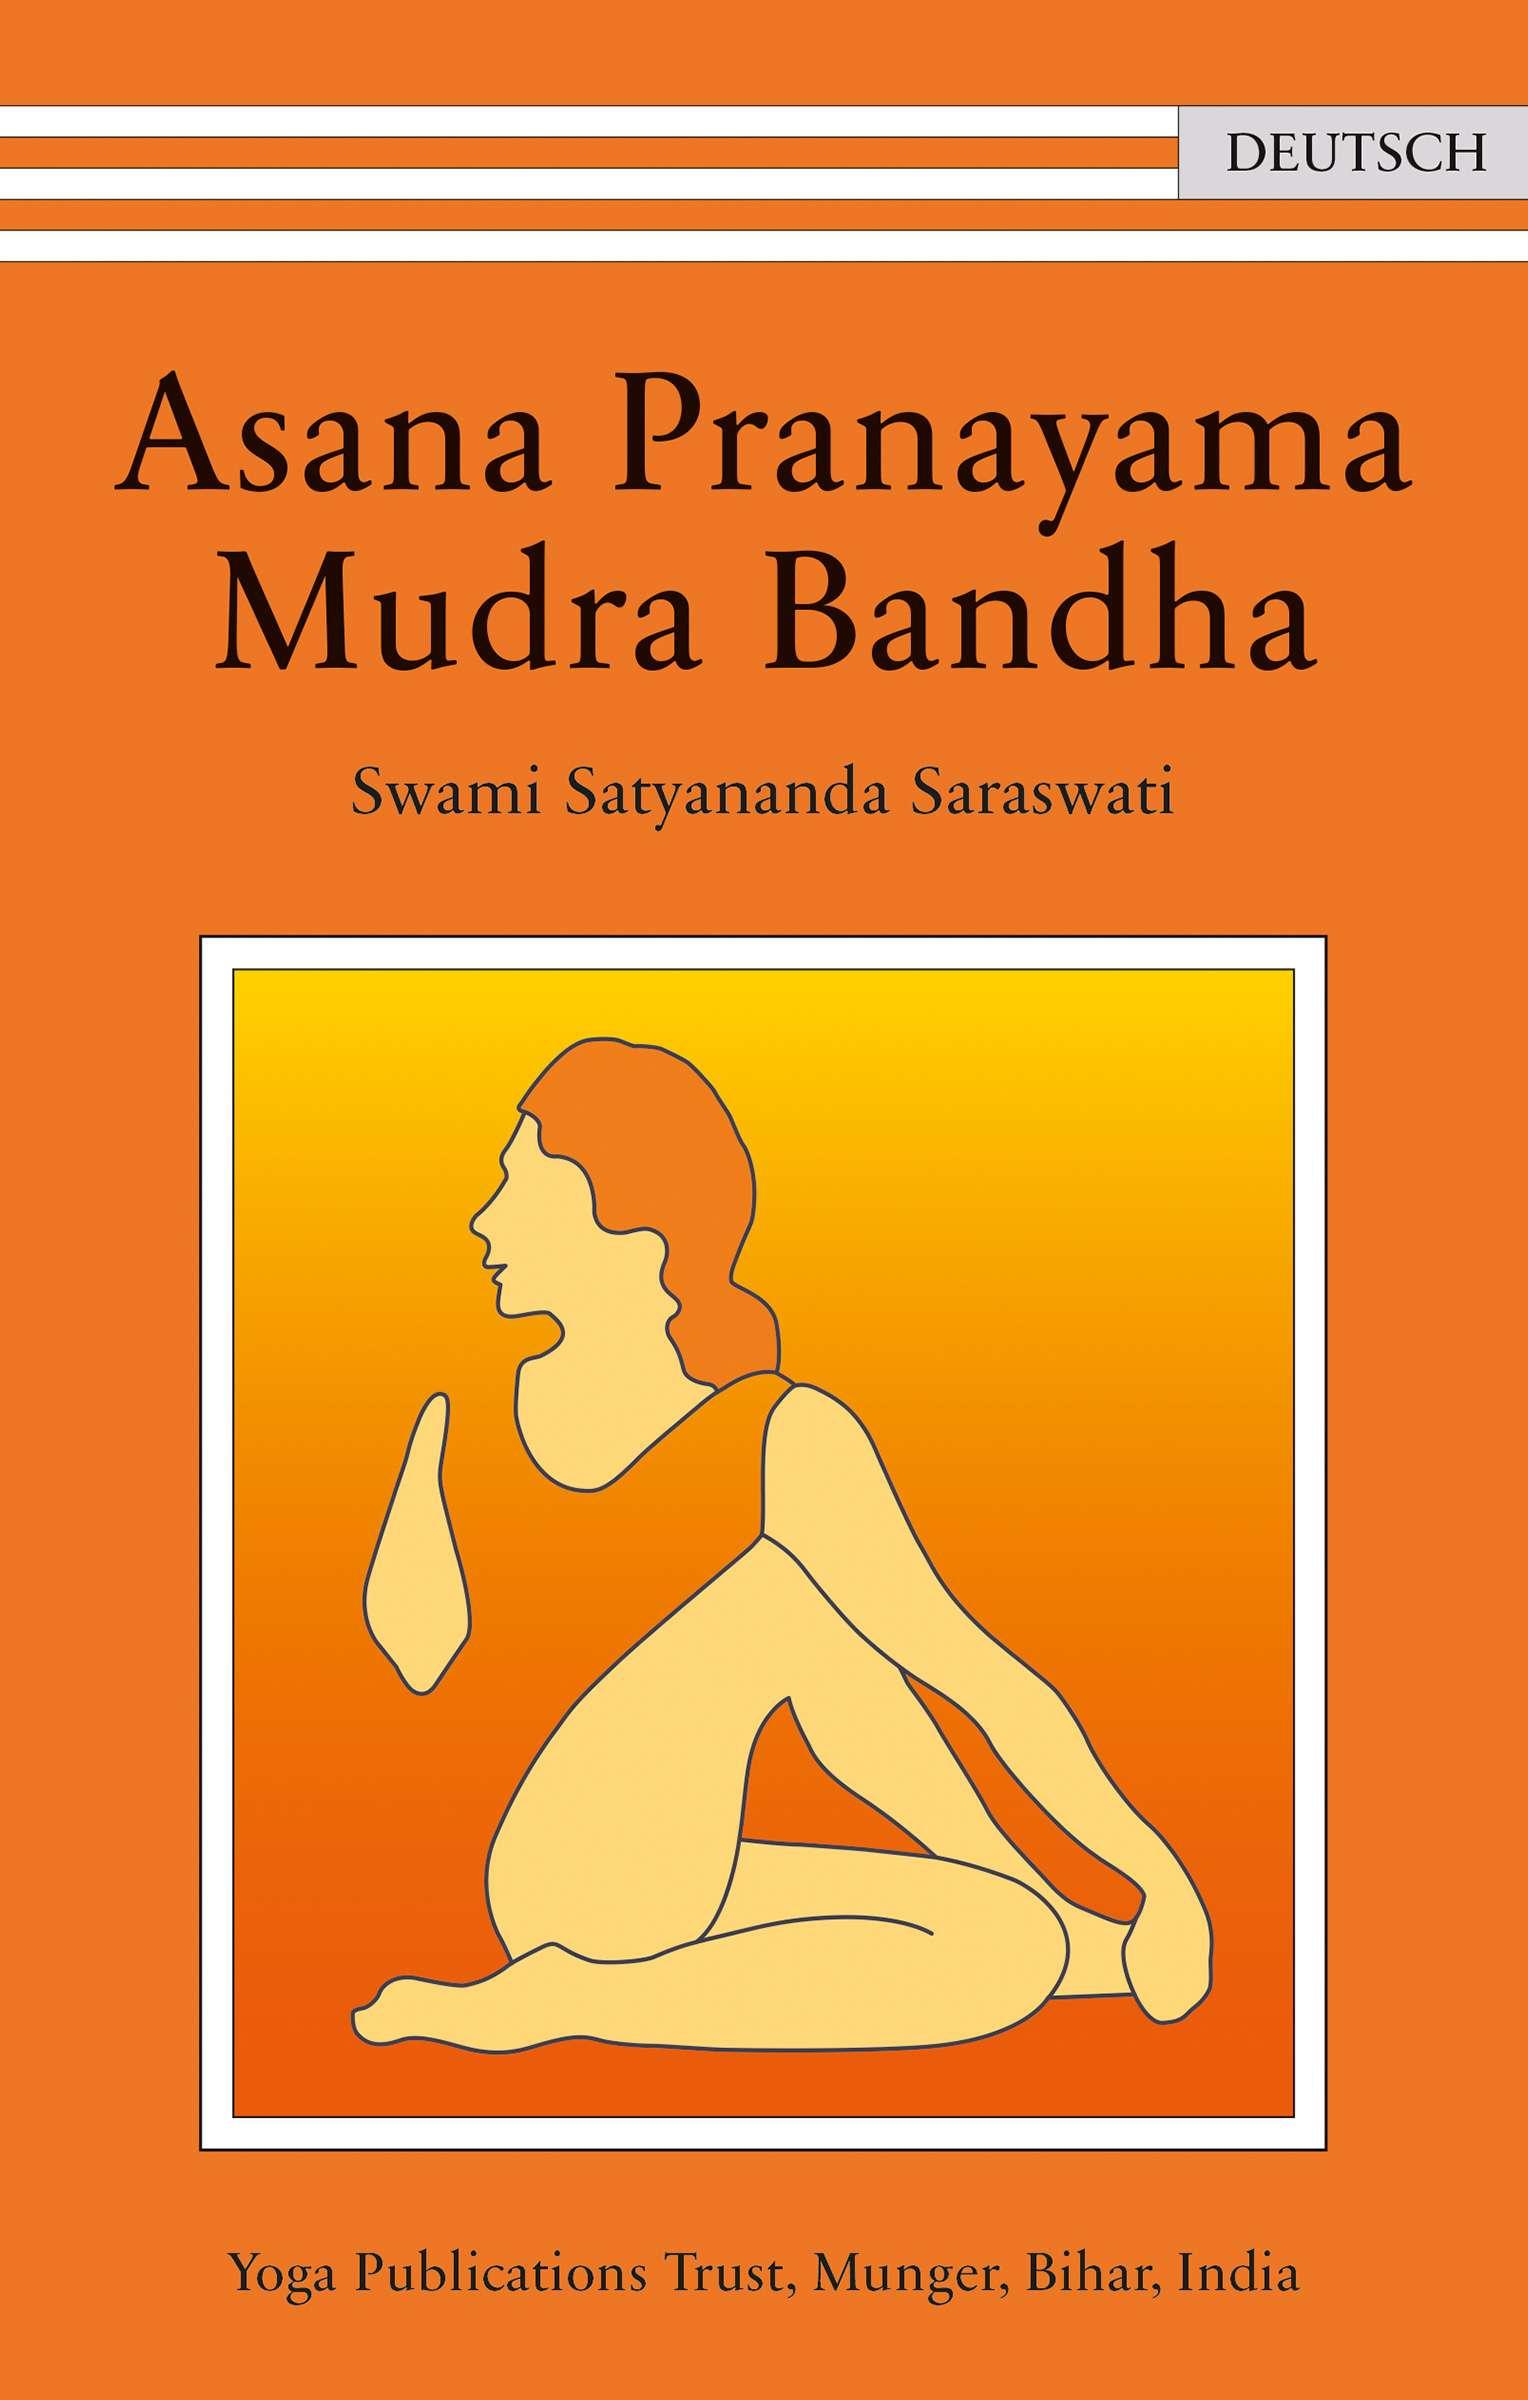 """Asana Pranayama Mudra Bandha"" von Swami Satyananda Saraswati © Ananda Verlag Yogannetteblog.de"